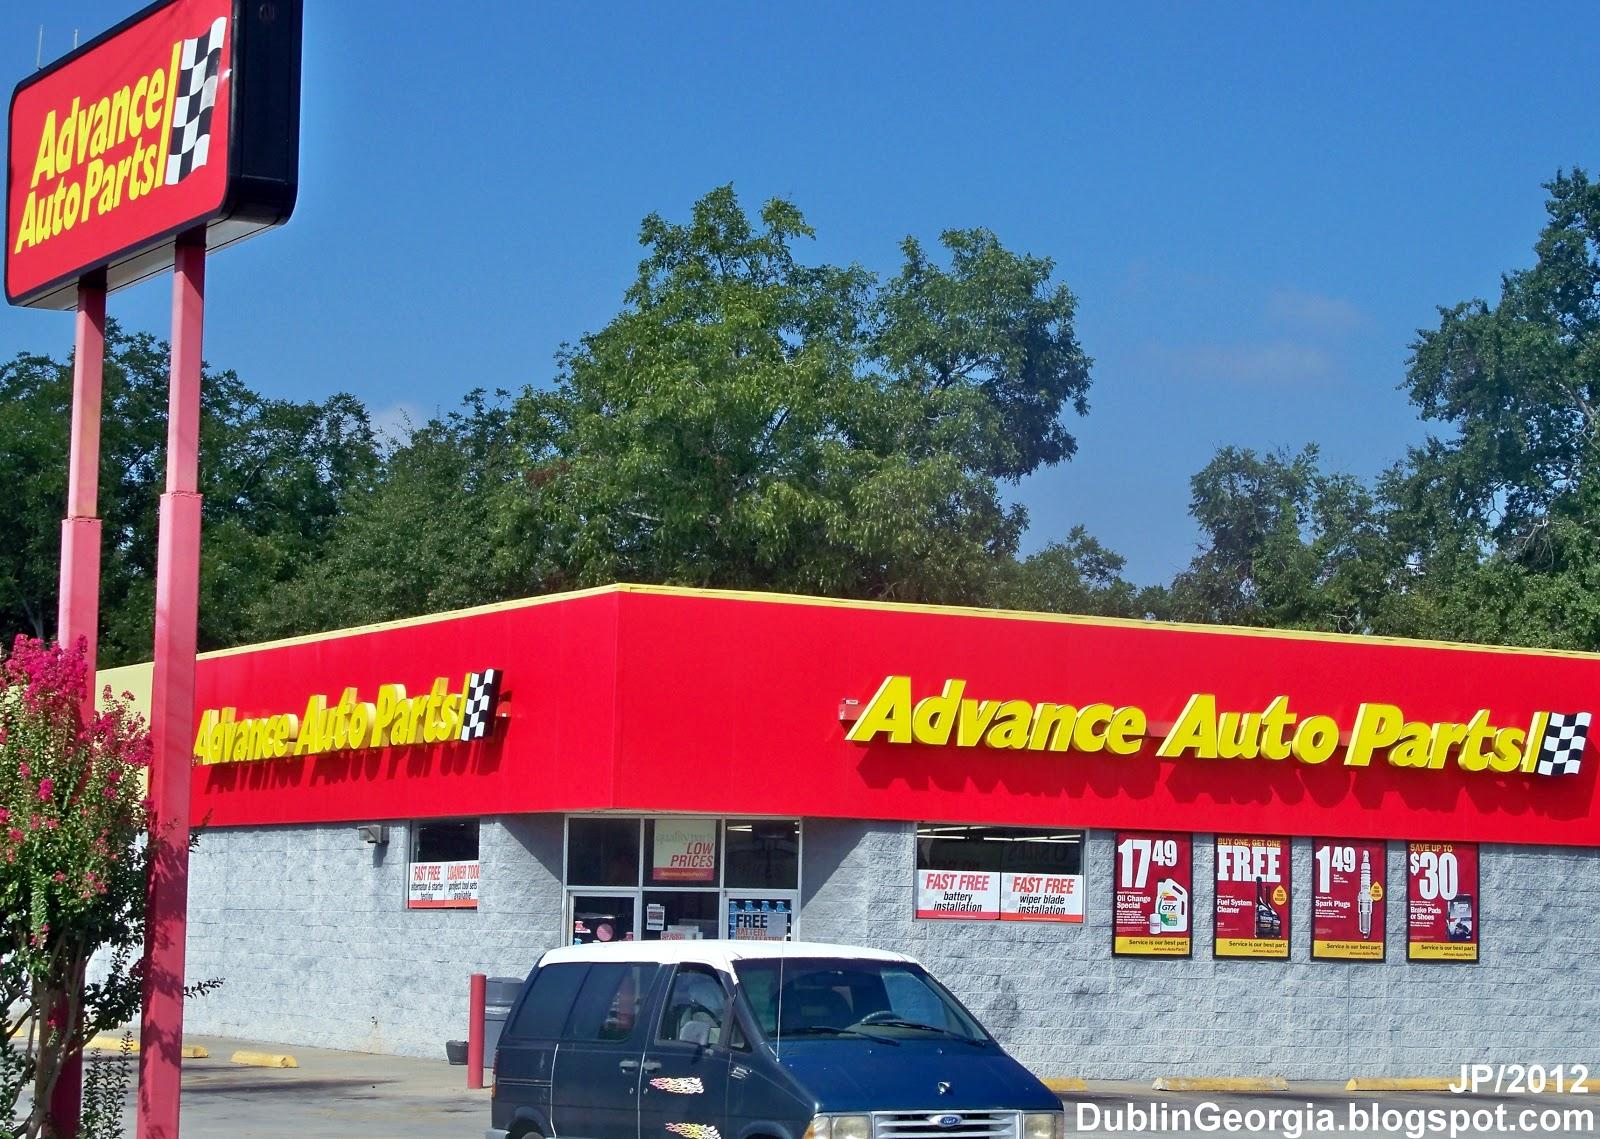 Advance Auto Parts Promo Code June 2015 Youtube - Advance auto parts locations wallpaper for desktop